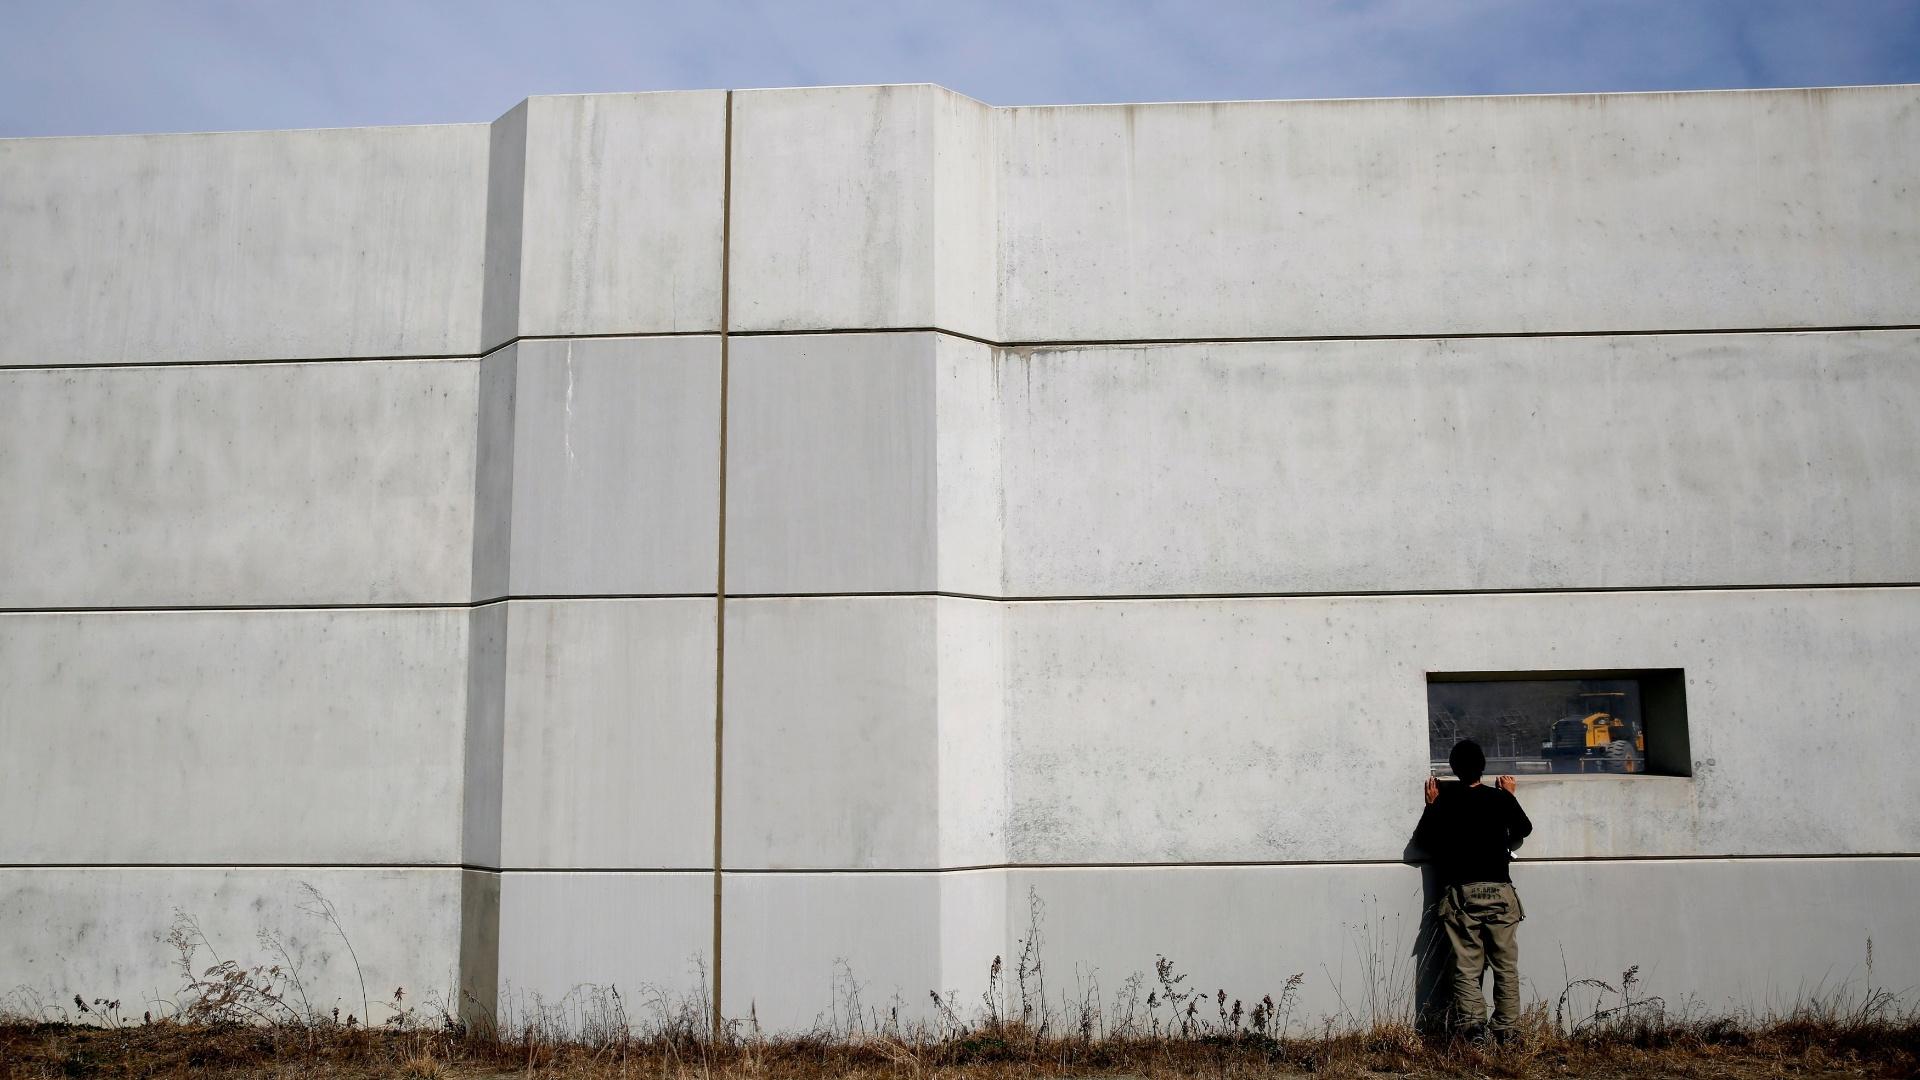 KIM KYUNG-HOON/Reuters